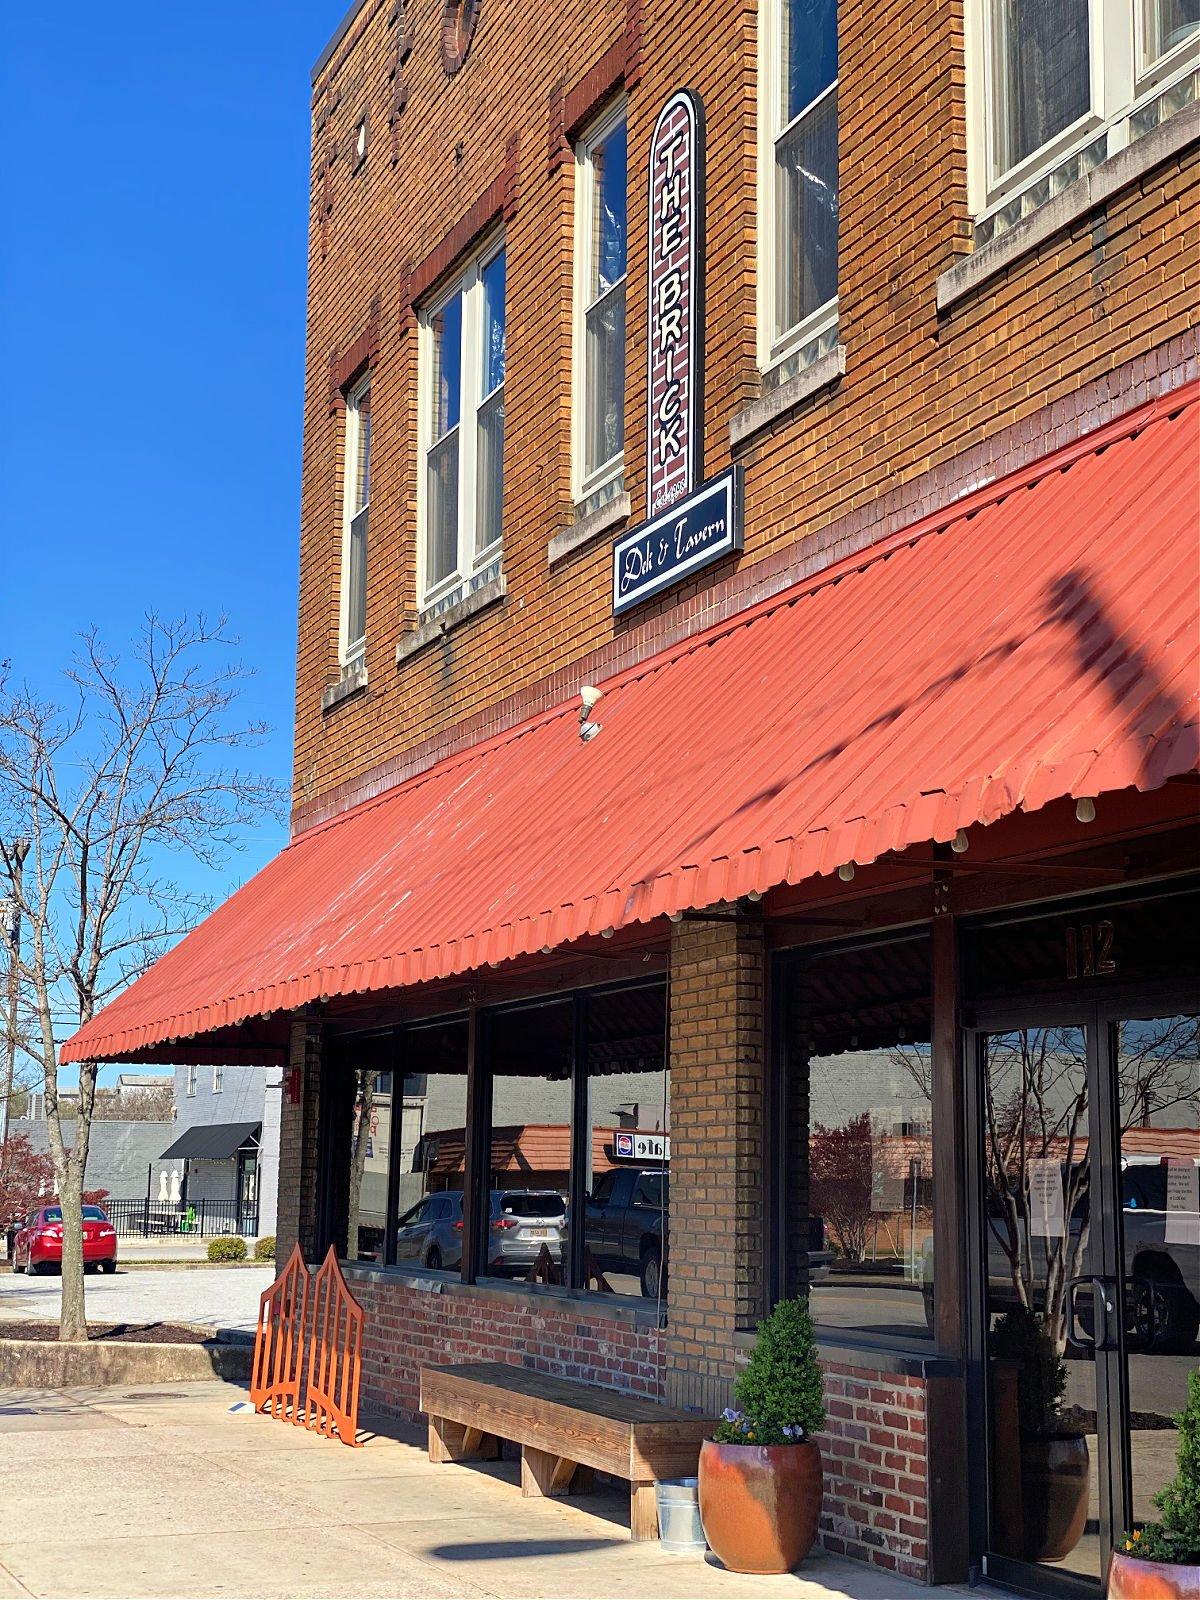 The front of The Brick Deli in Decatur.